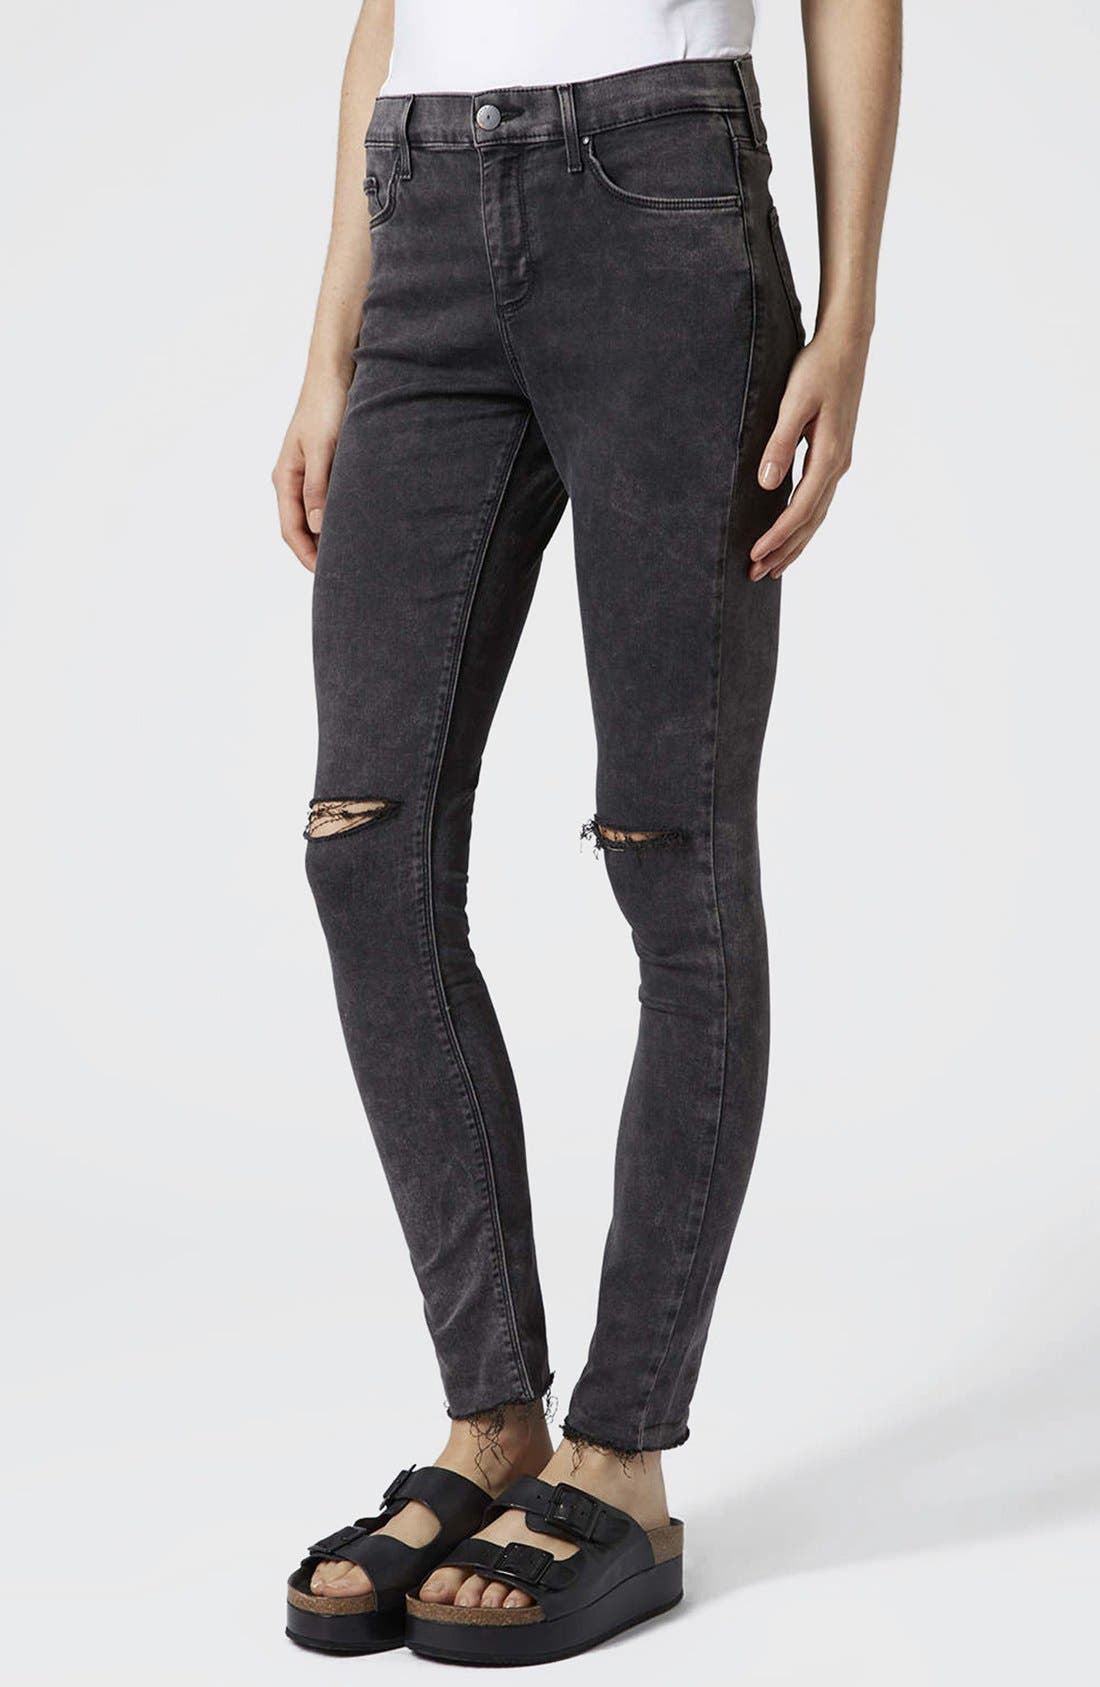 Alternate Image 1 Selected - Topshop Moto 'Leigh' Distressed Skinny Jeans (Black)